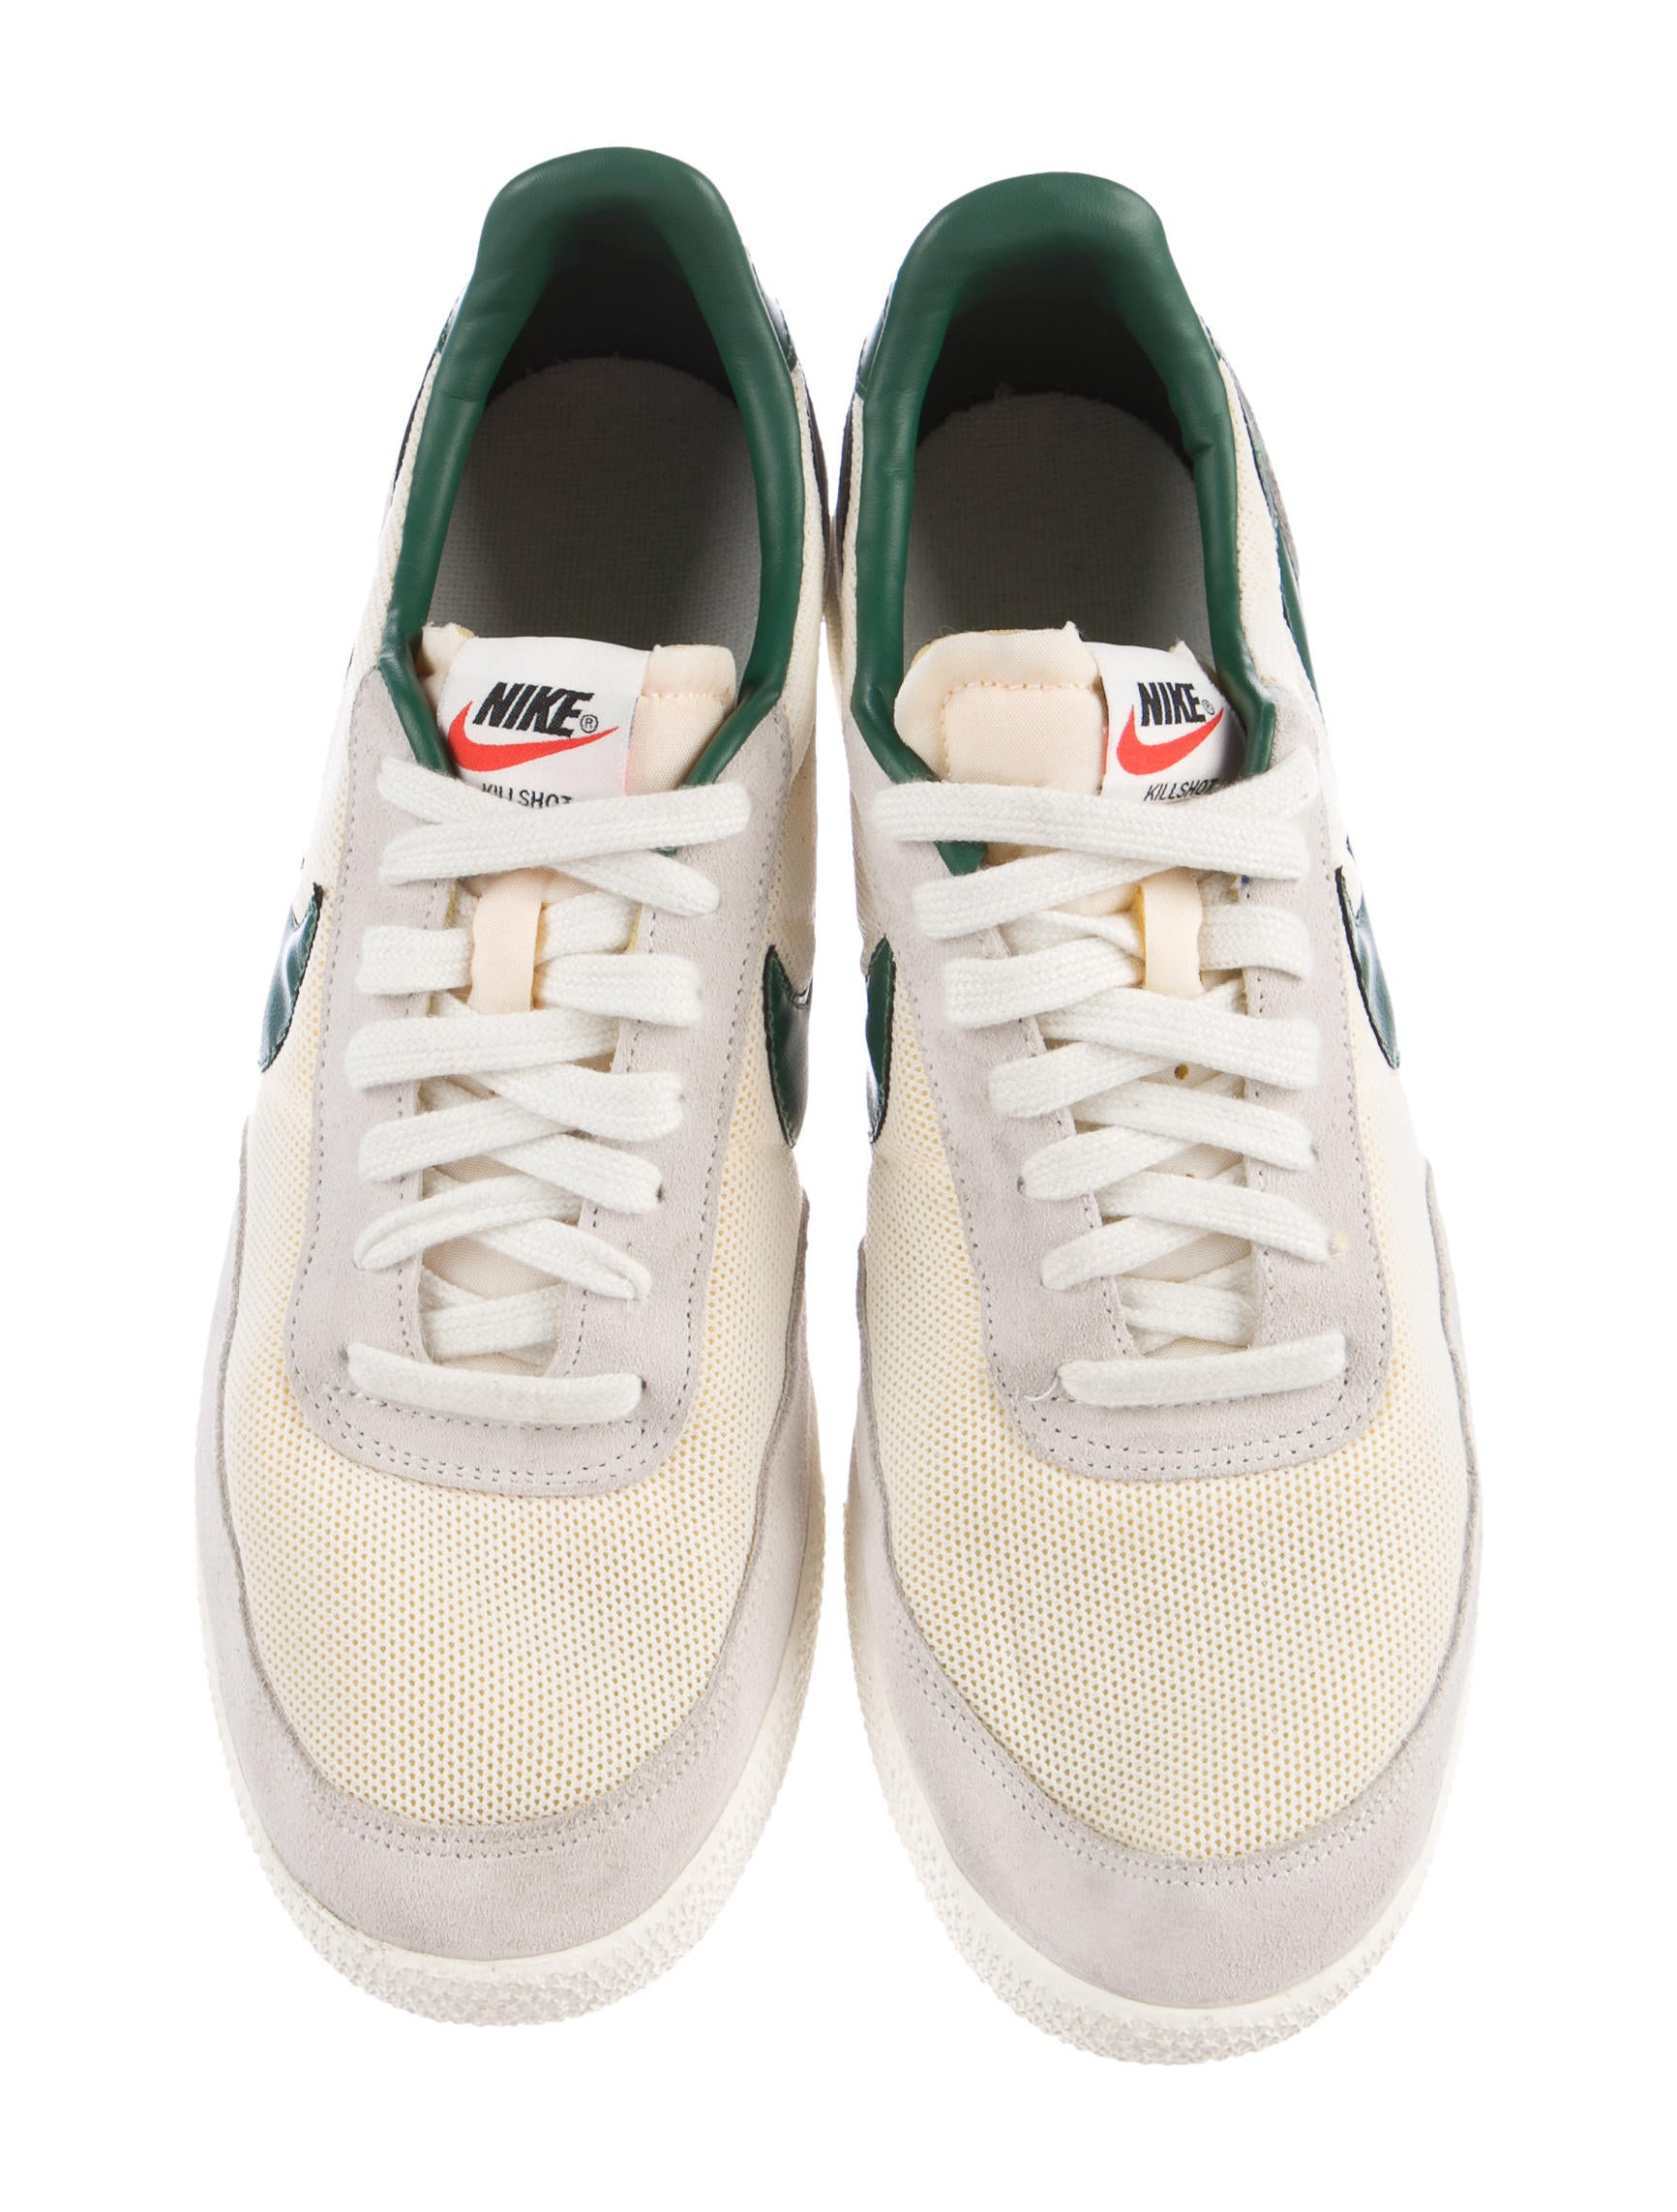 Killshot 2 Low-Top Sneakers